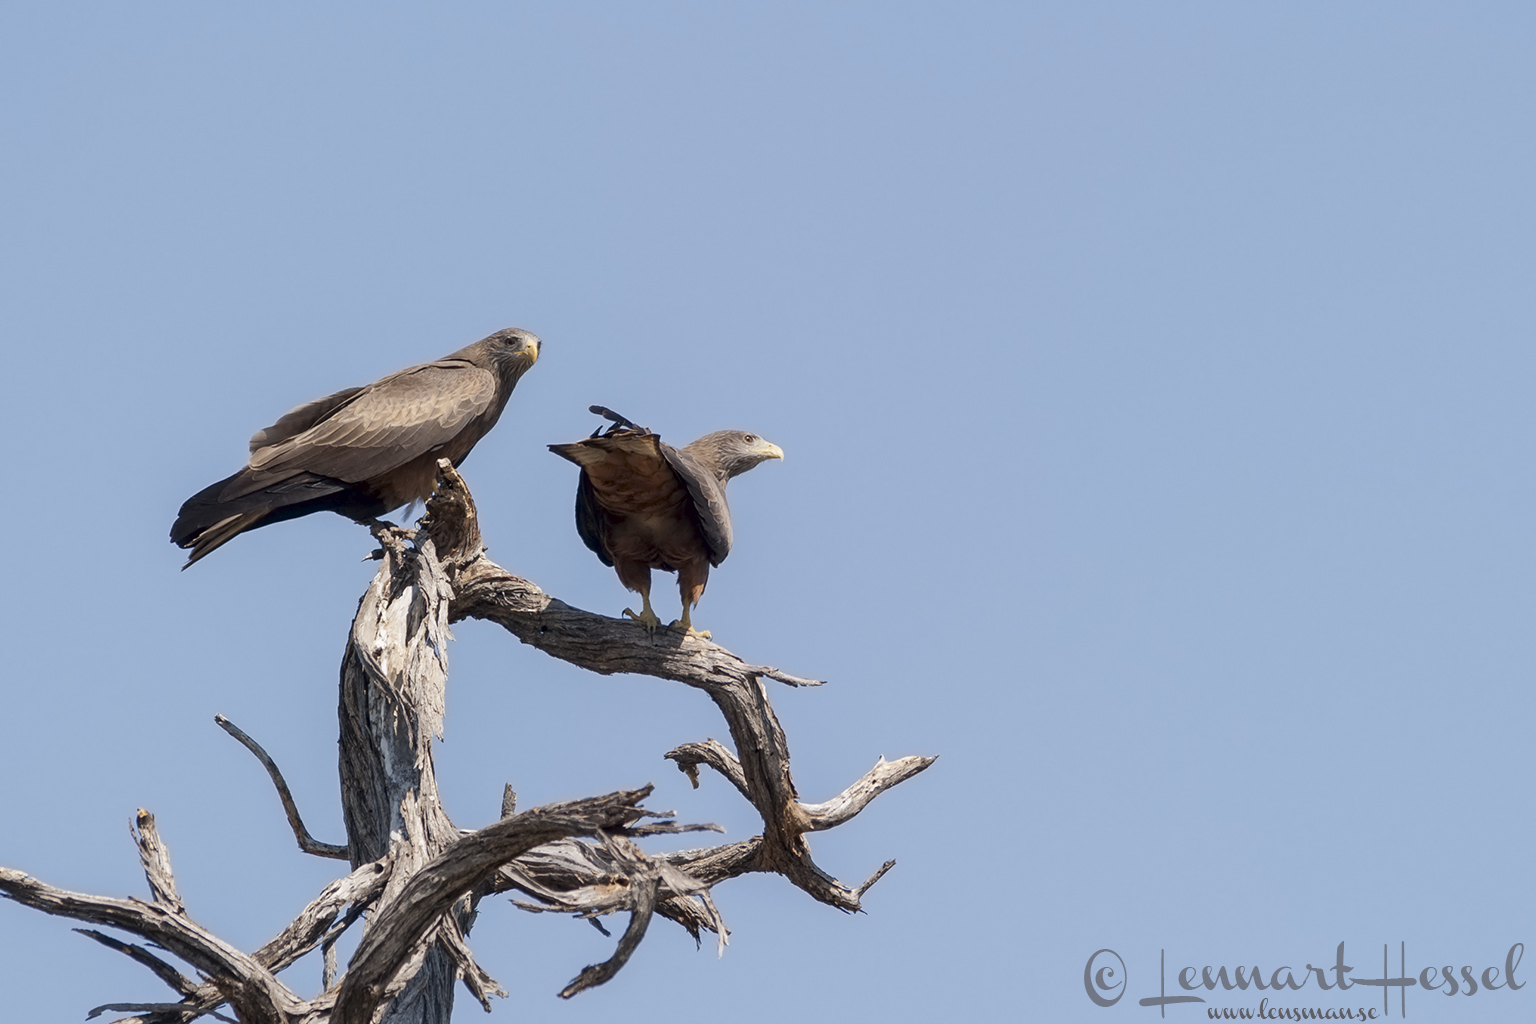 Yellow-billed Kite in Moremi Game Reserve, Botswana